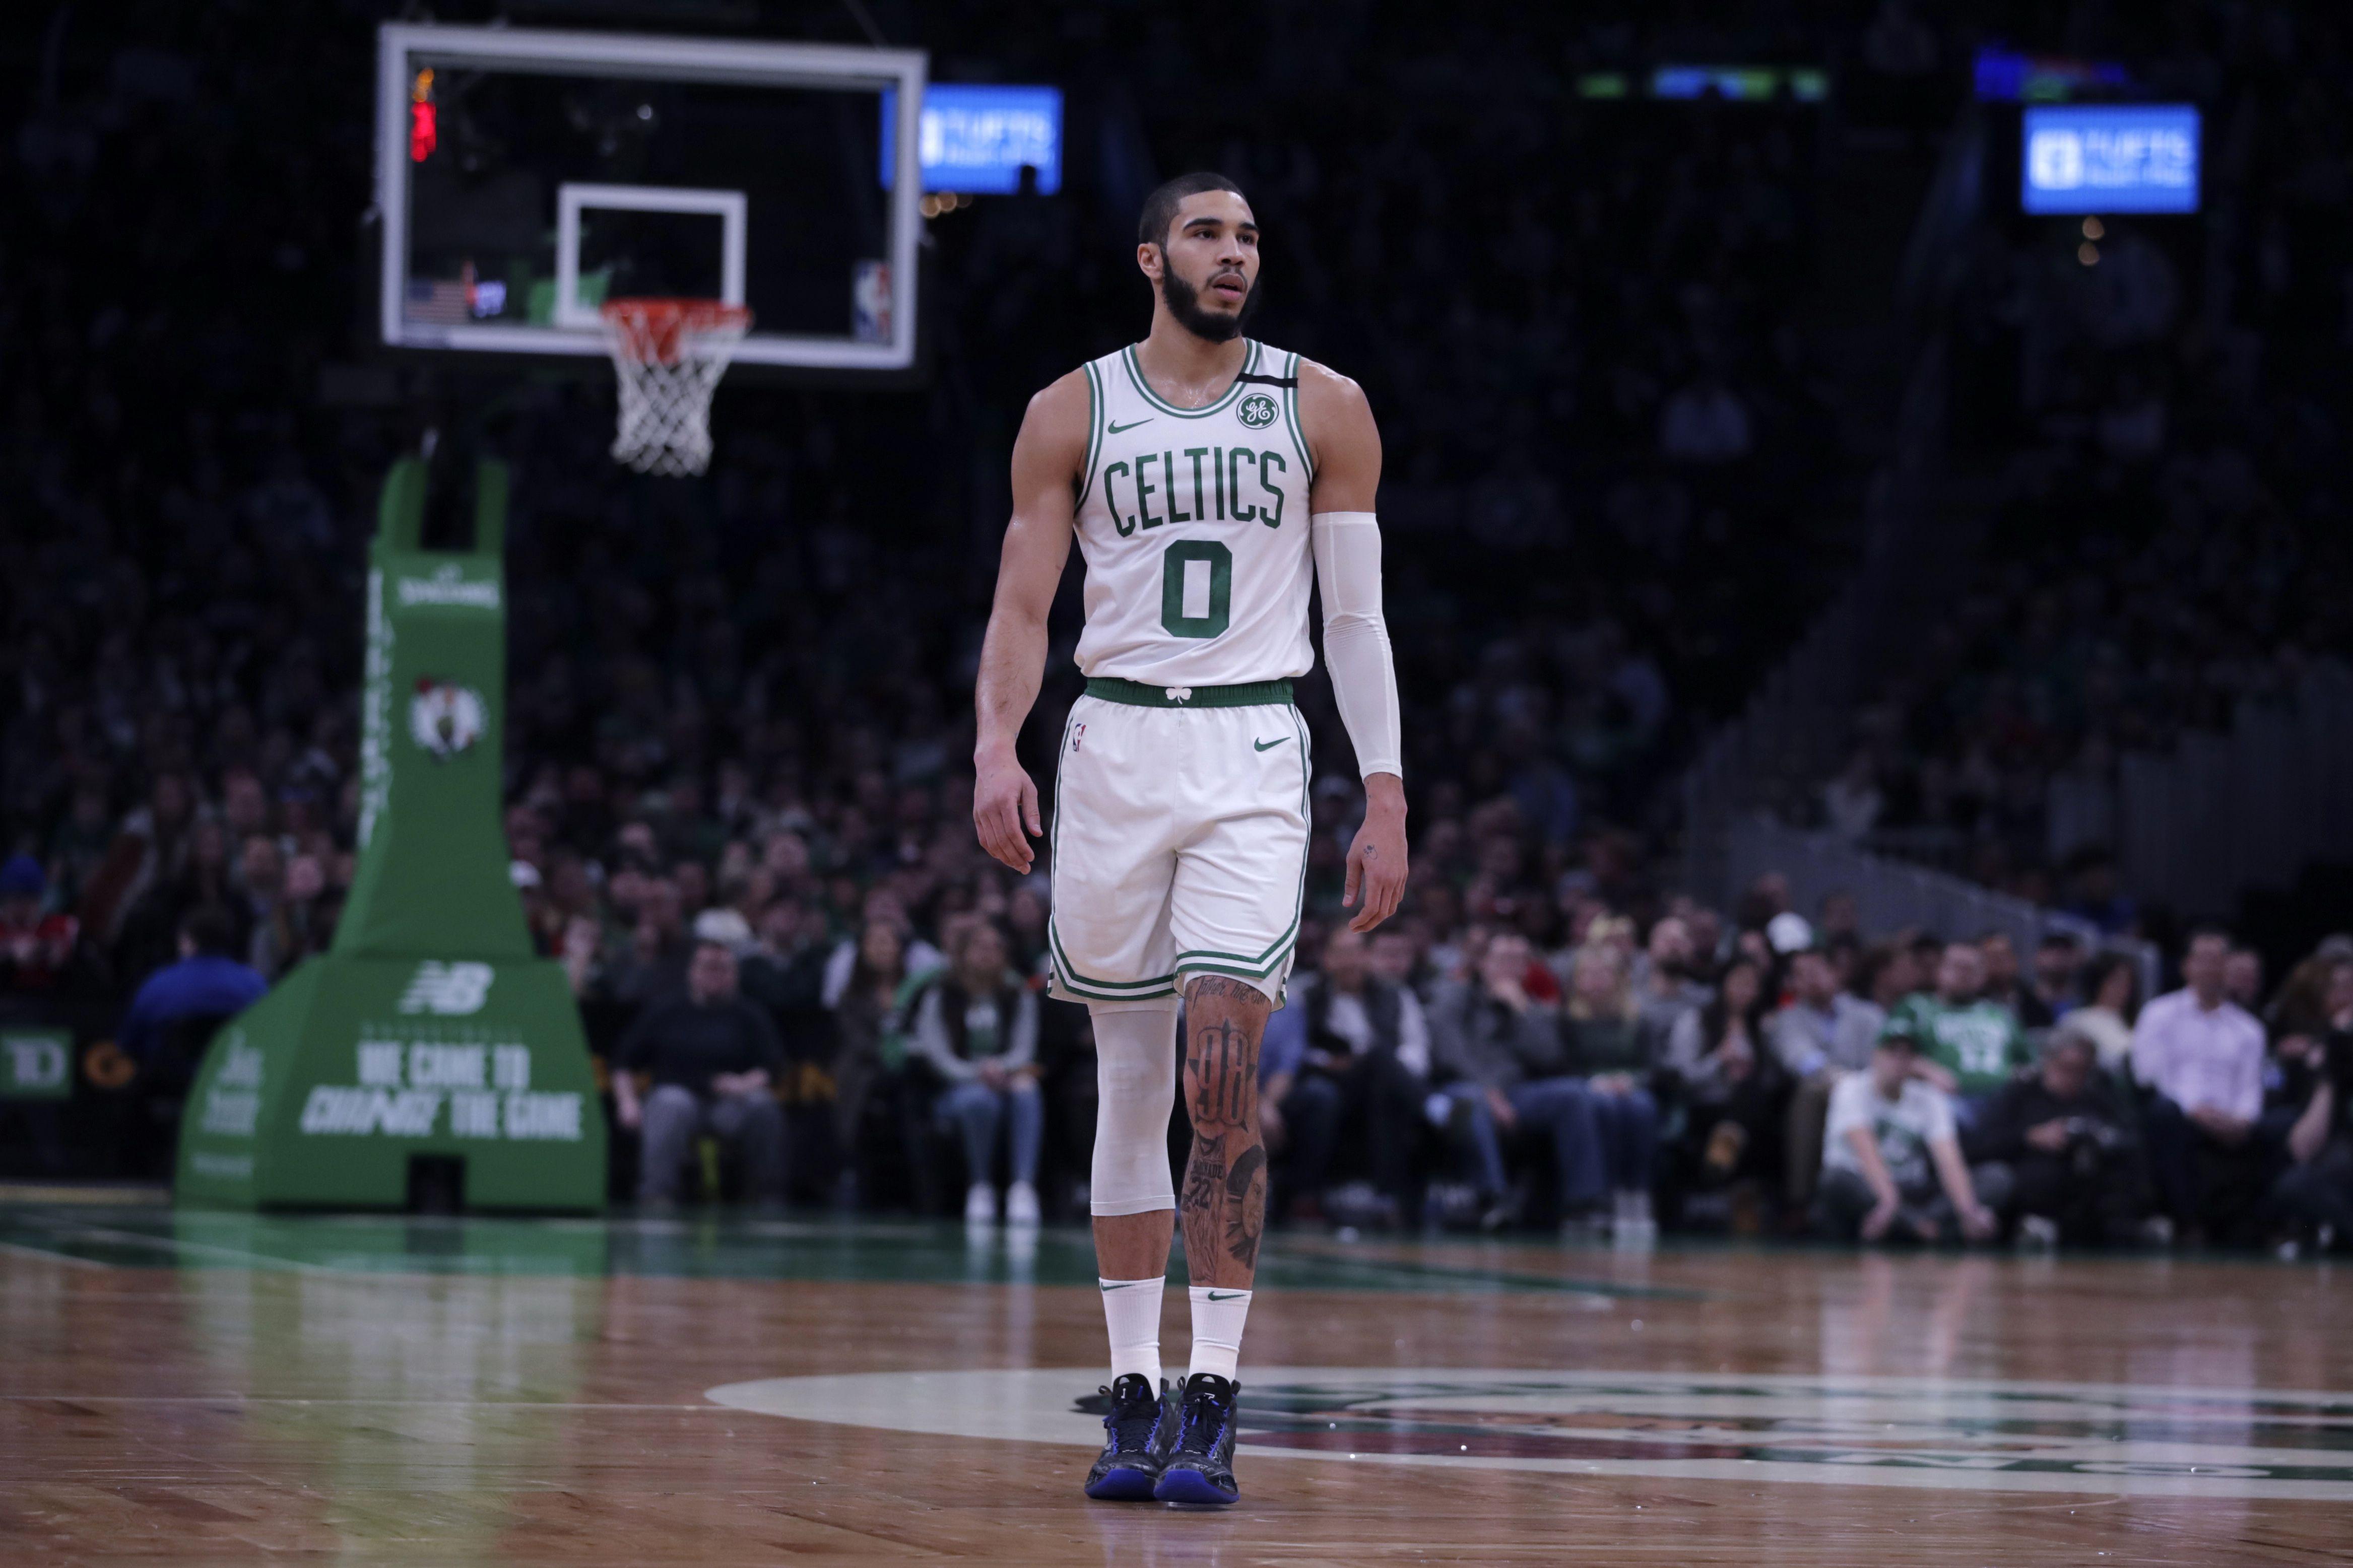 NBA most popular jerseys: Jayson Tatum fourth, Boston Celtics ...